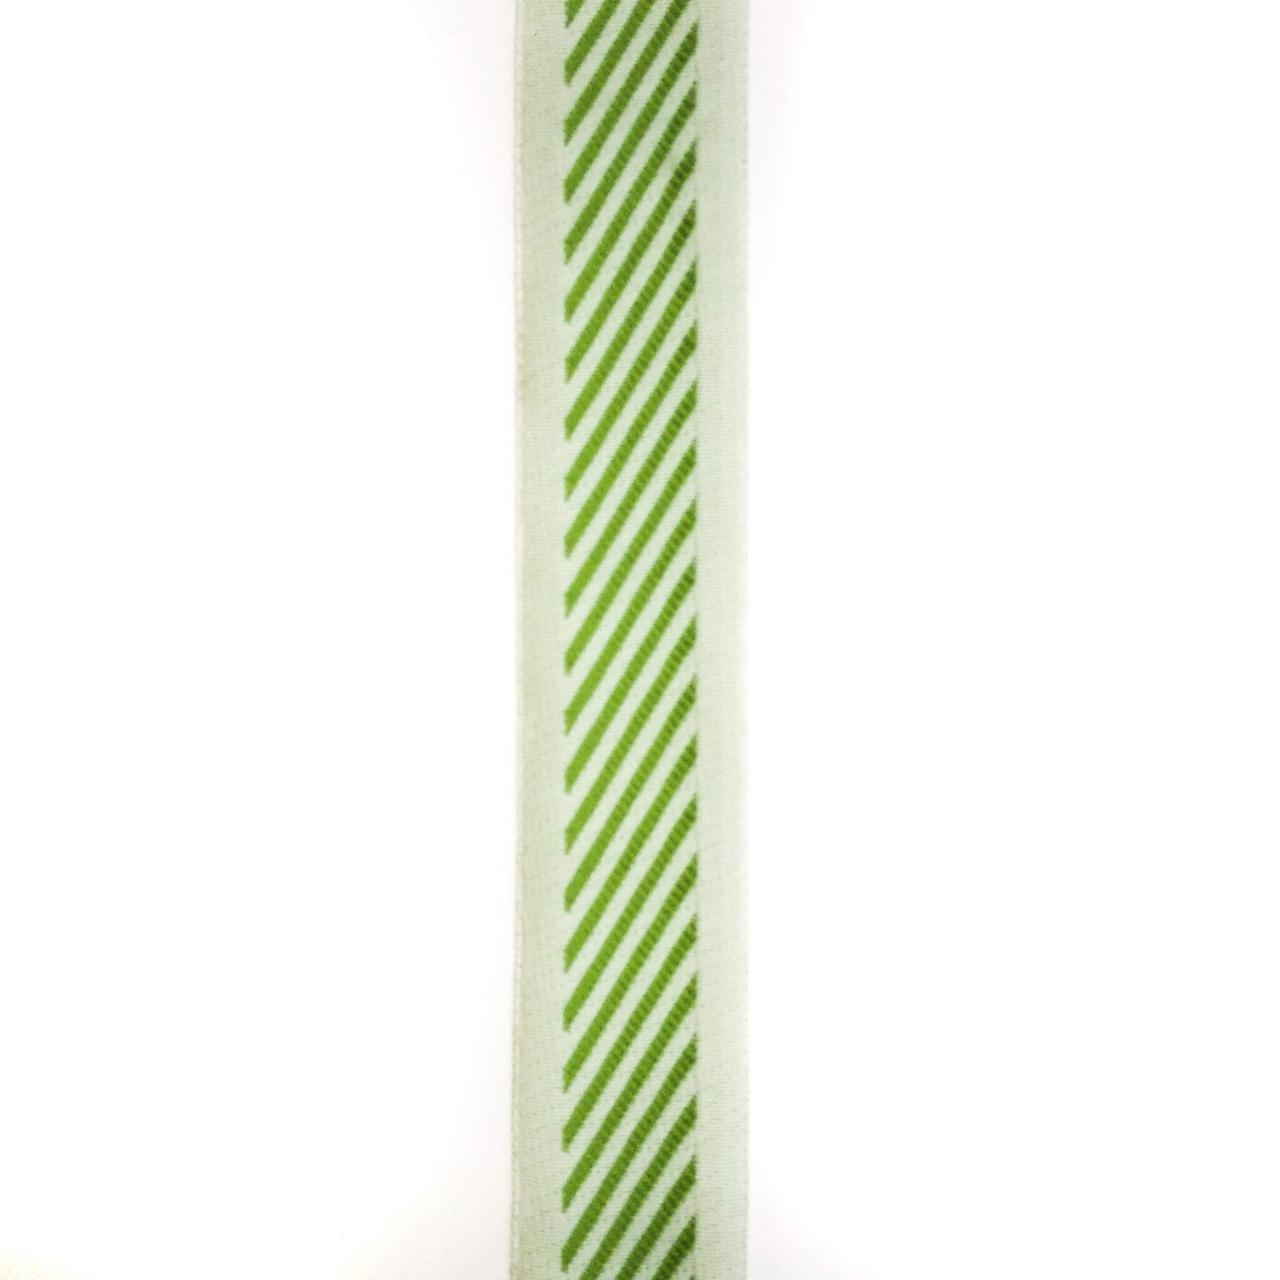 Стрічка обробна одеяльная 32 мм (50м/рулон)